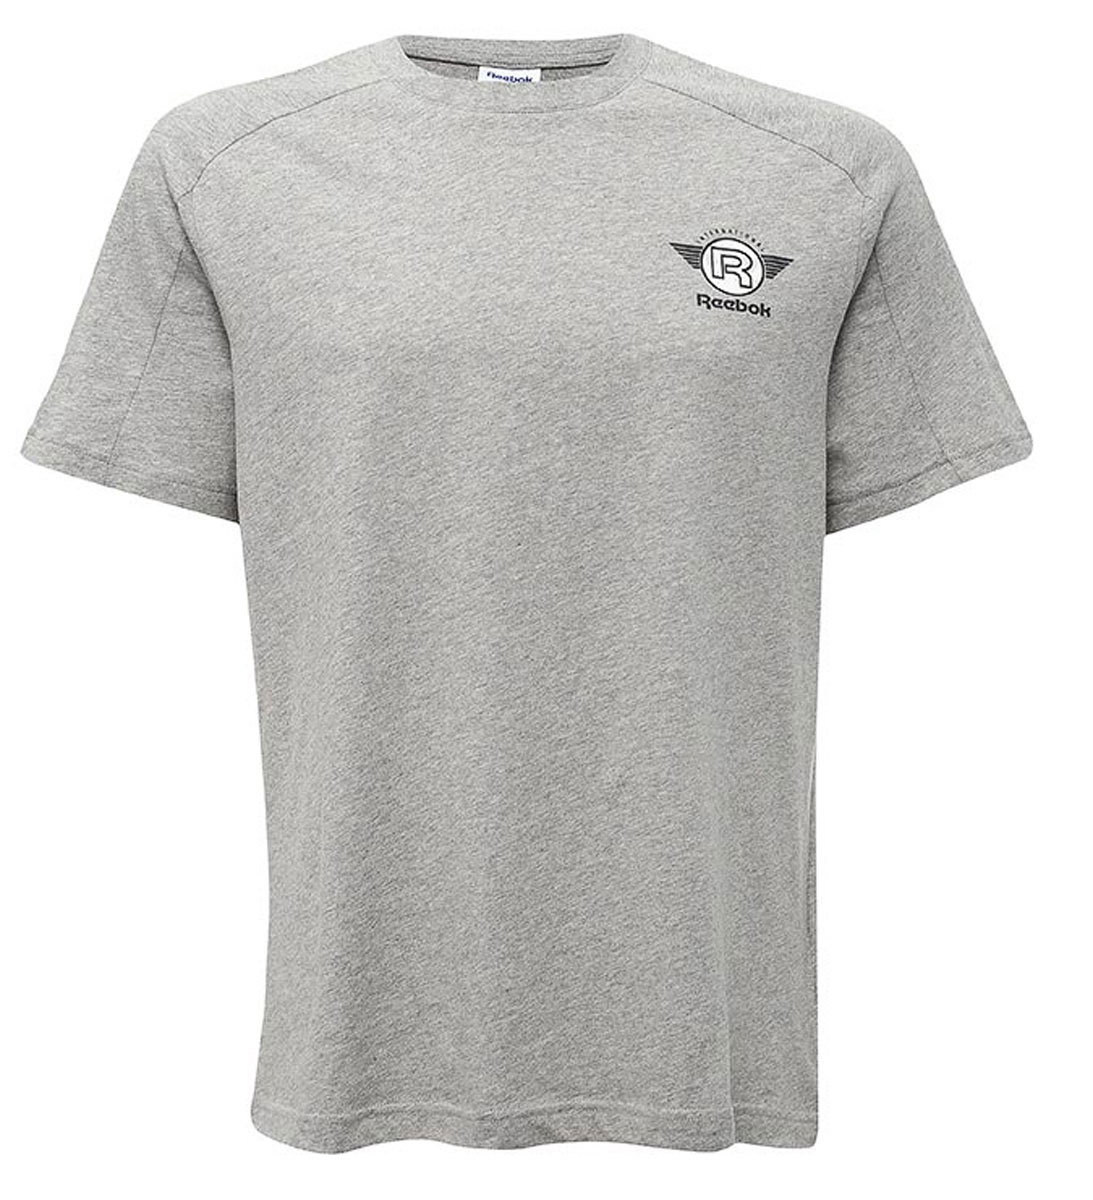 цены на Футболка мужская Reebok F Gr Tee, цвет: серый. BQ2700. Размер XL (56/58) в интернет-магазинах